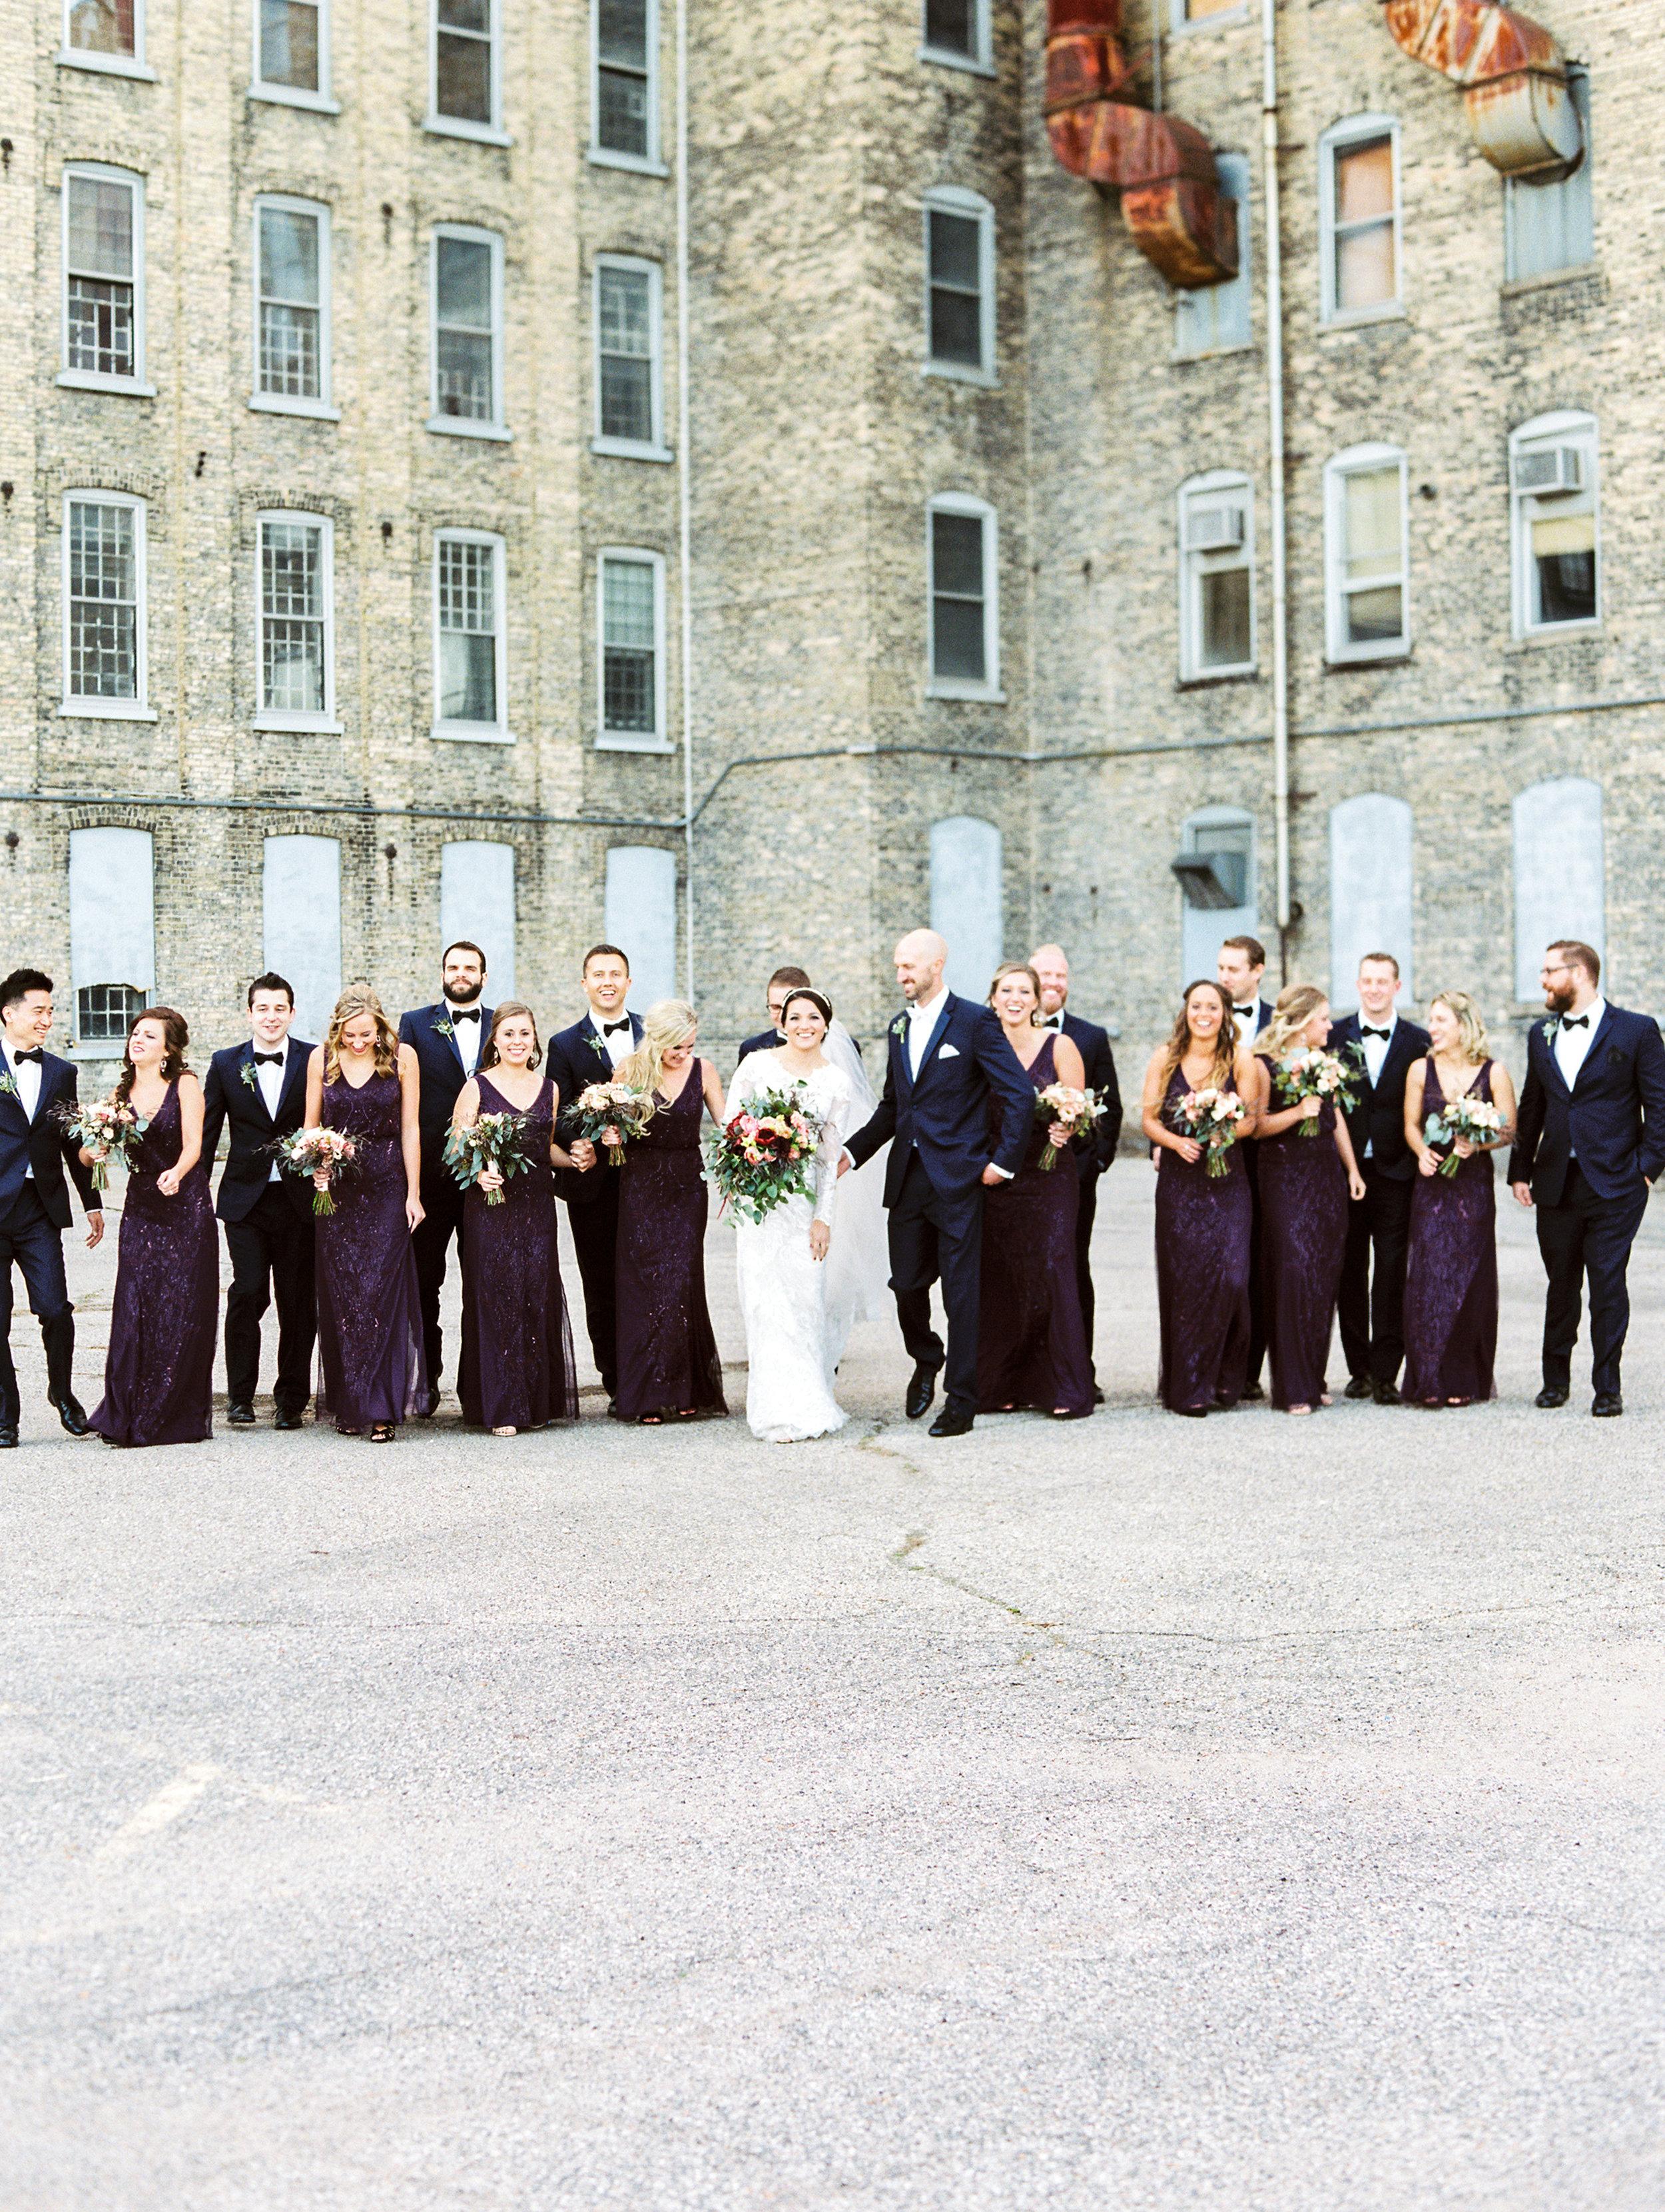 Vogelzang+Wedding+Bridal+Party-54.jpg